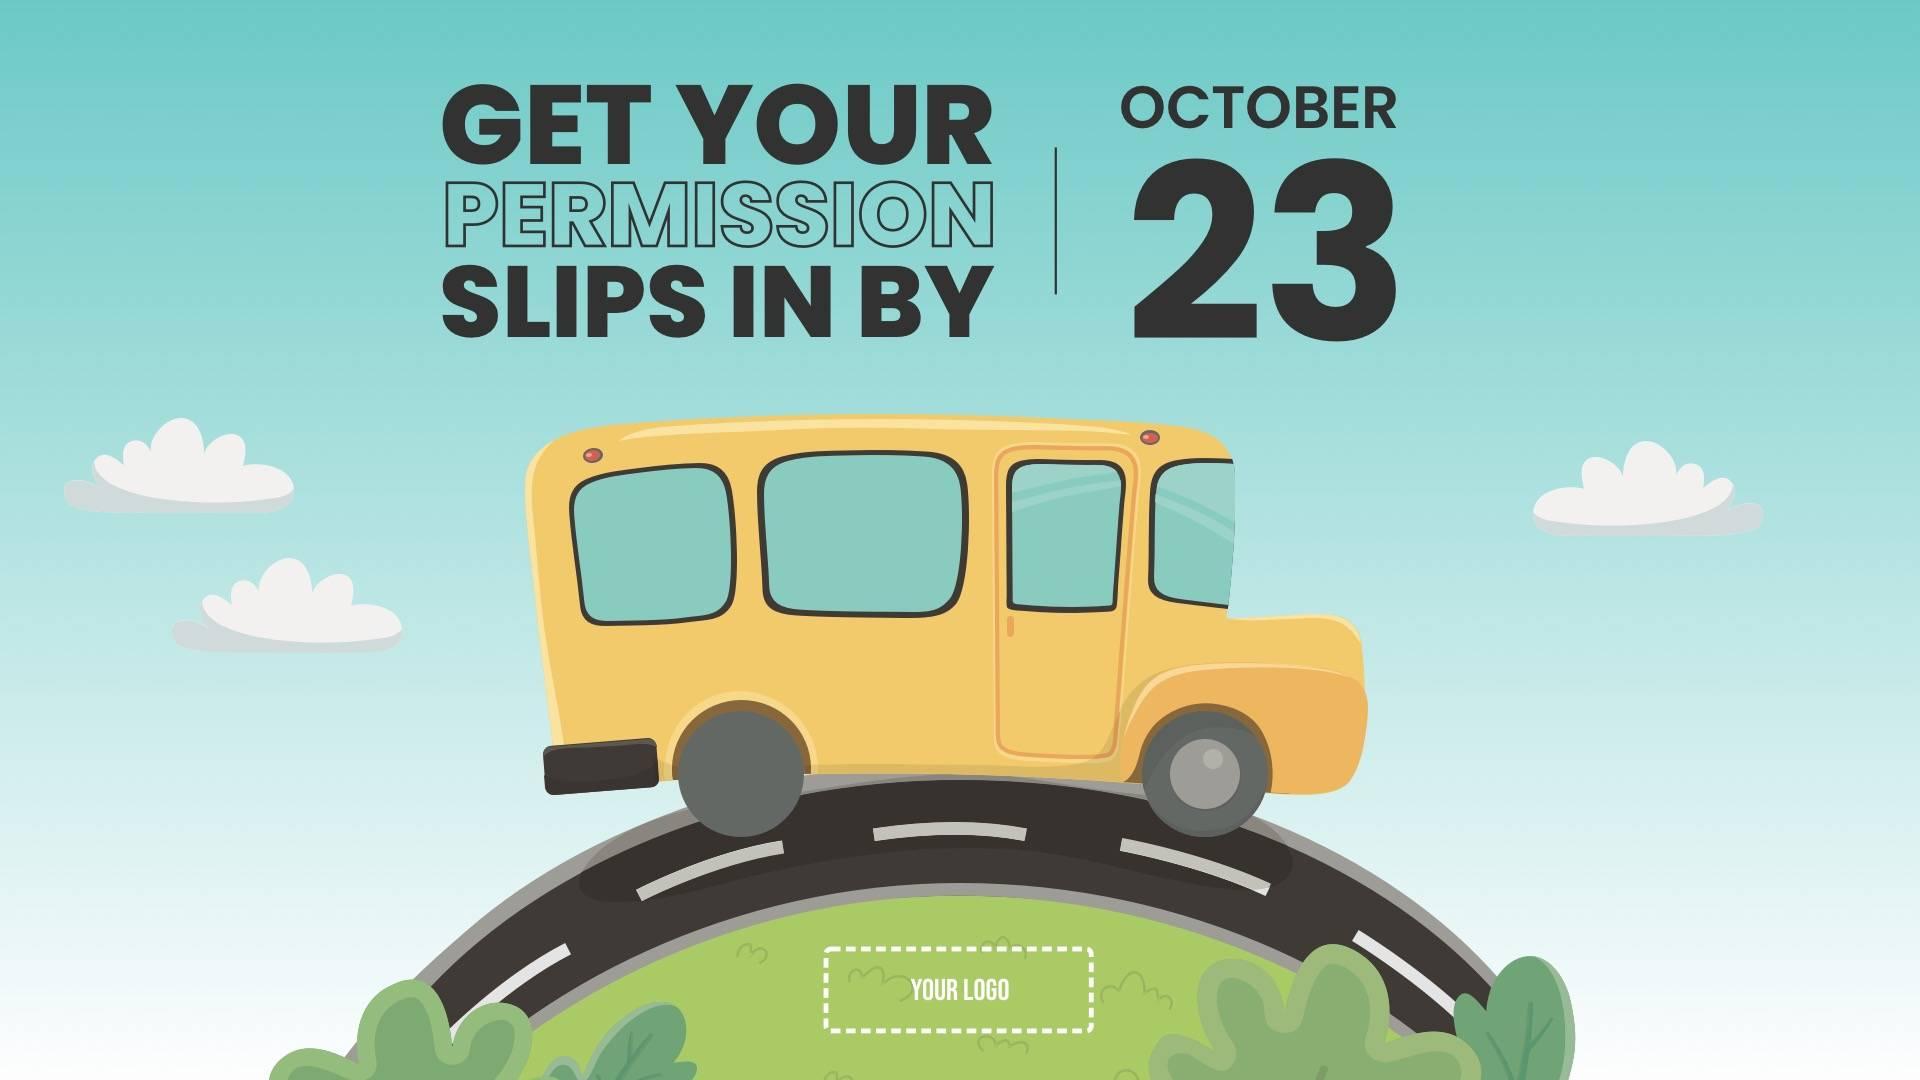 Permission Slip Reminder Digital Signage Template